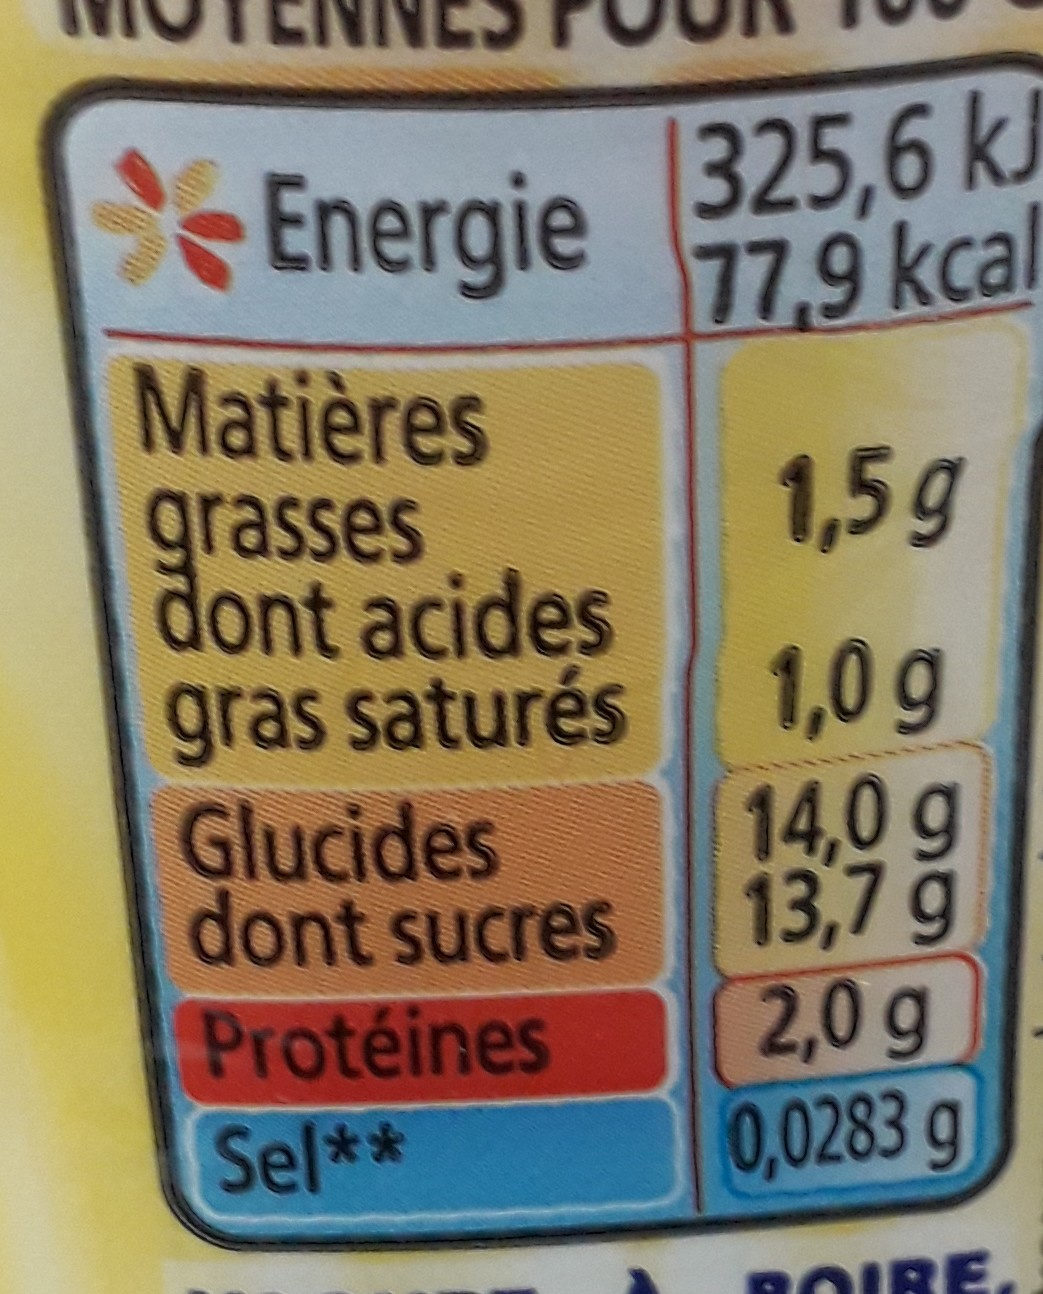 Yop orange passion - Informations nutritionnelles - fr